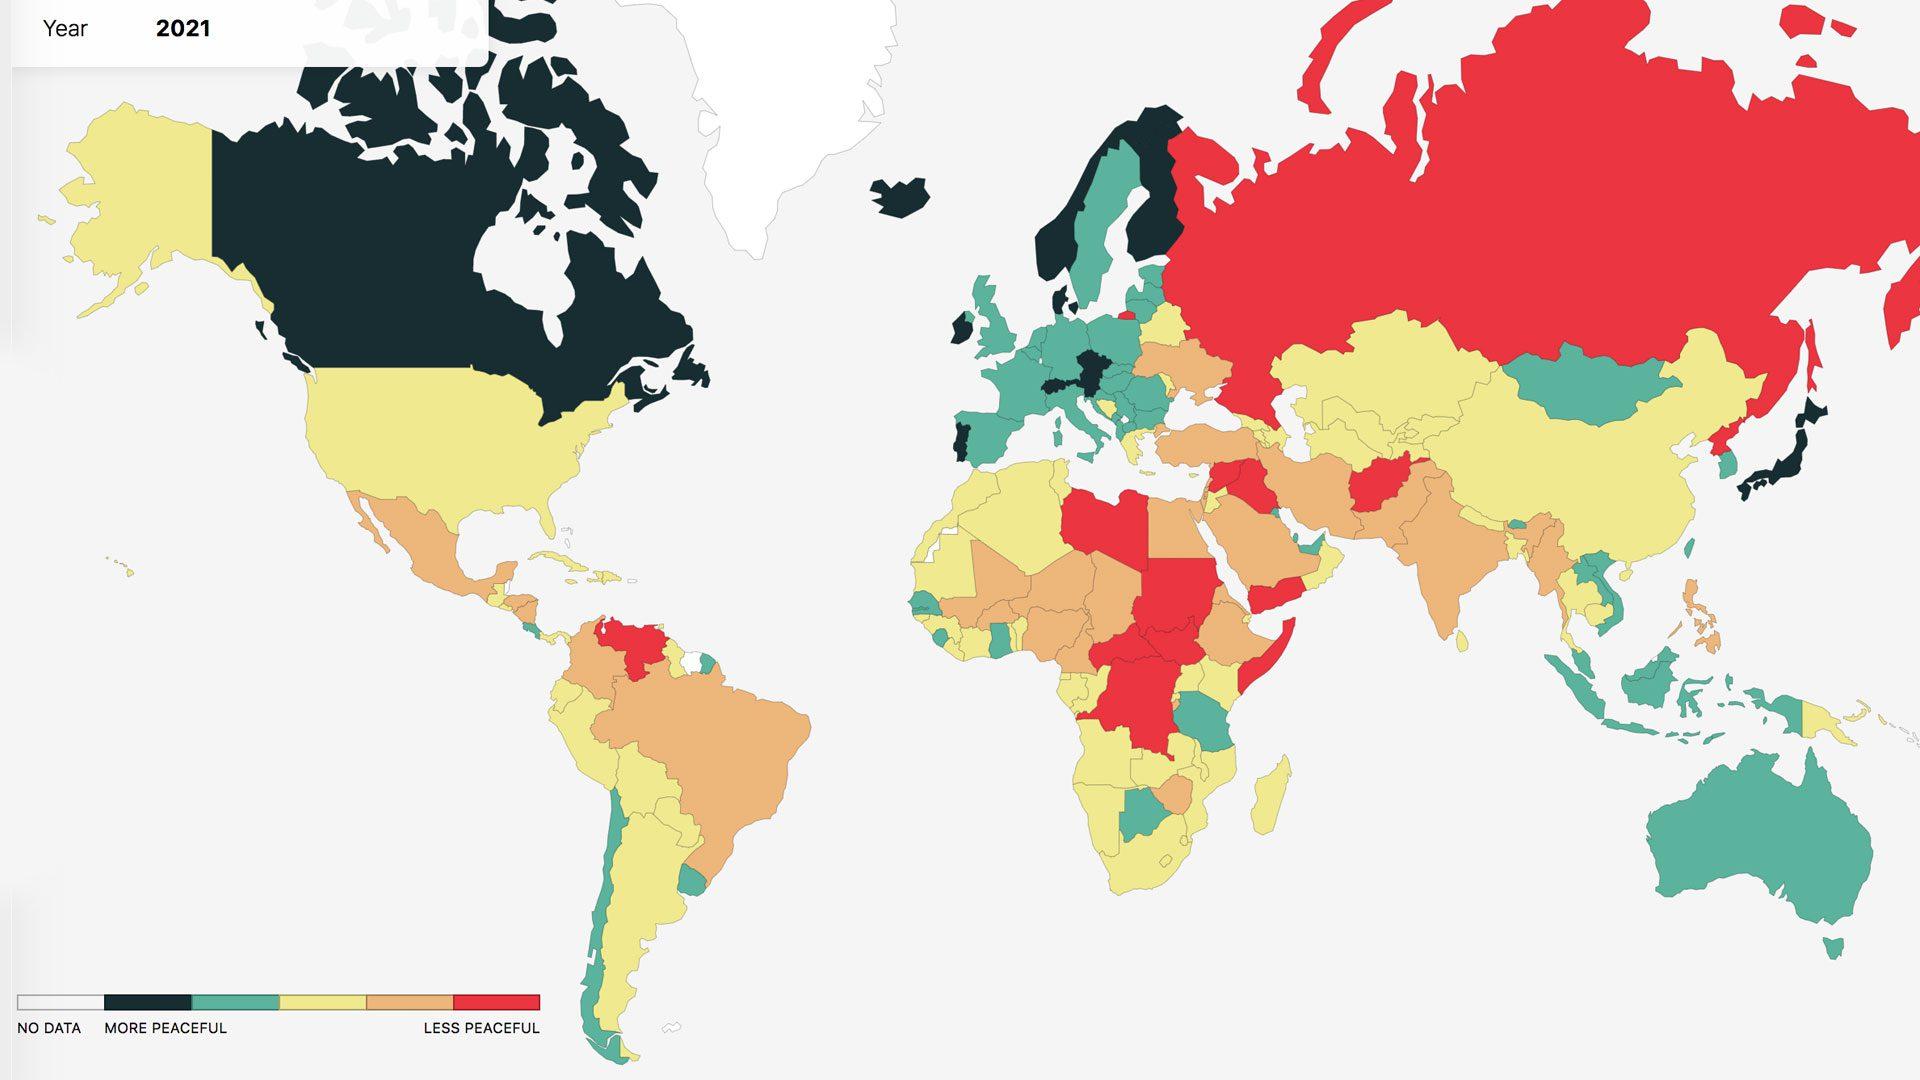 World map ranking peace 2021